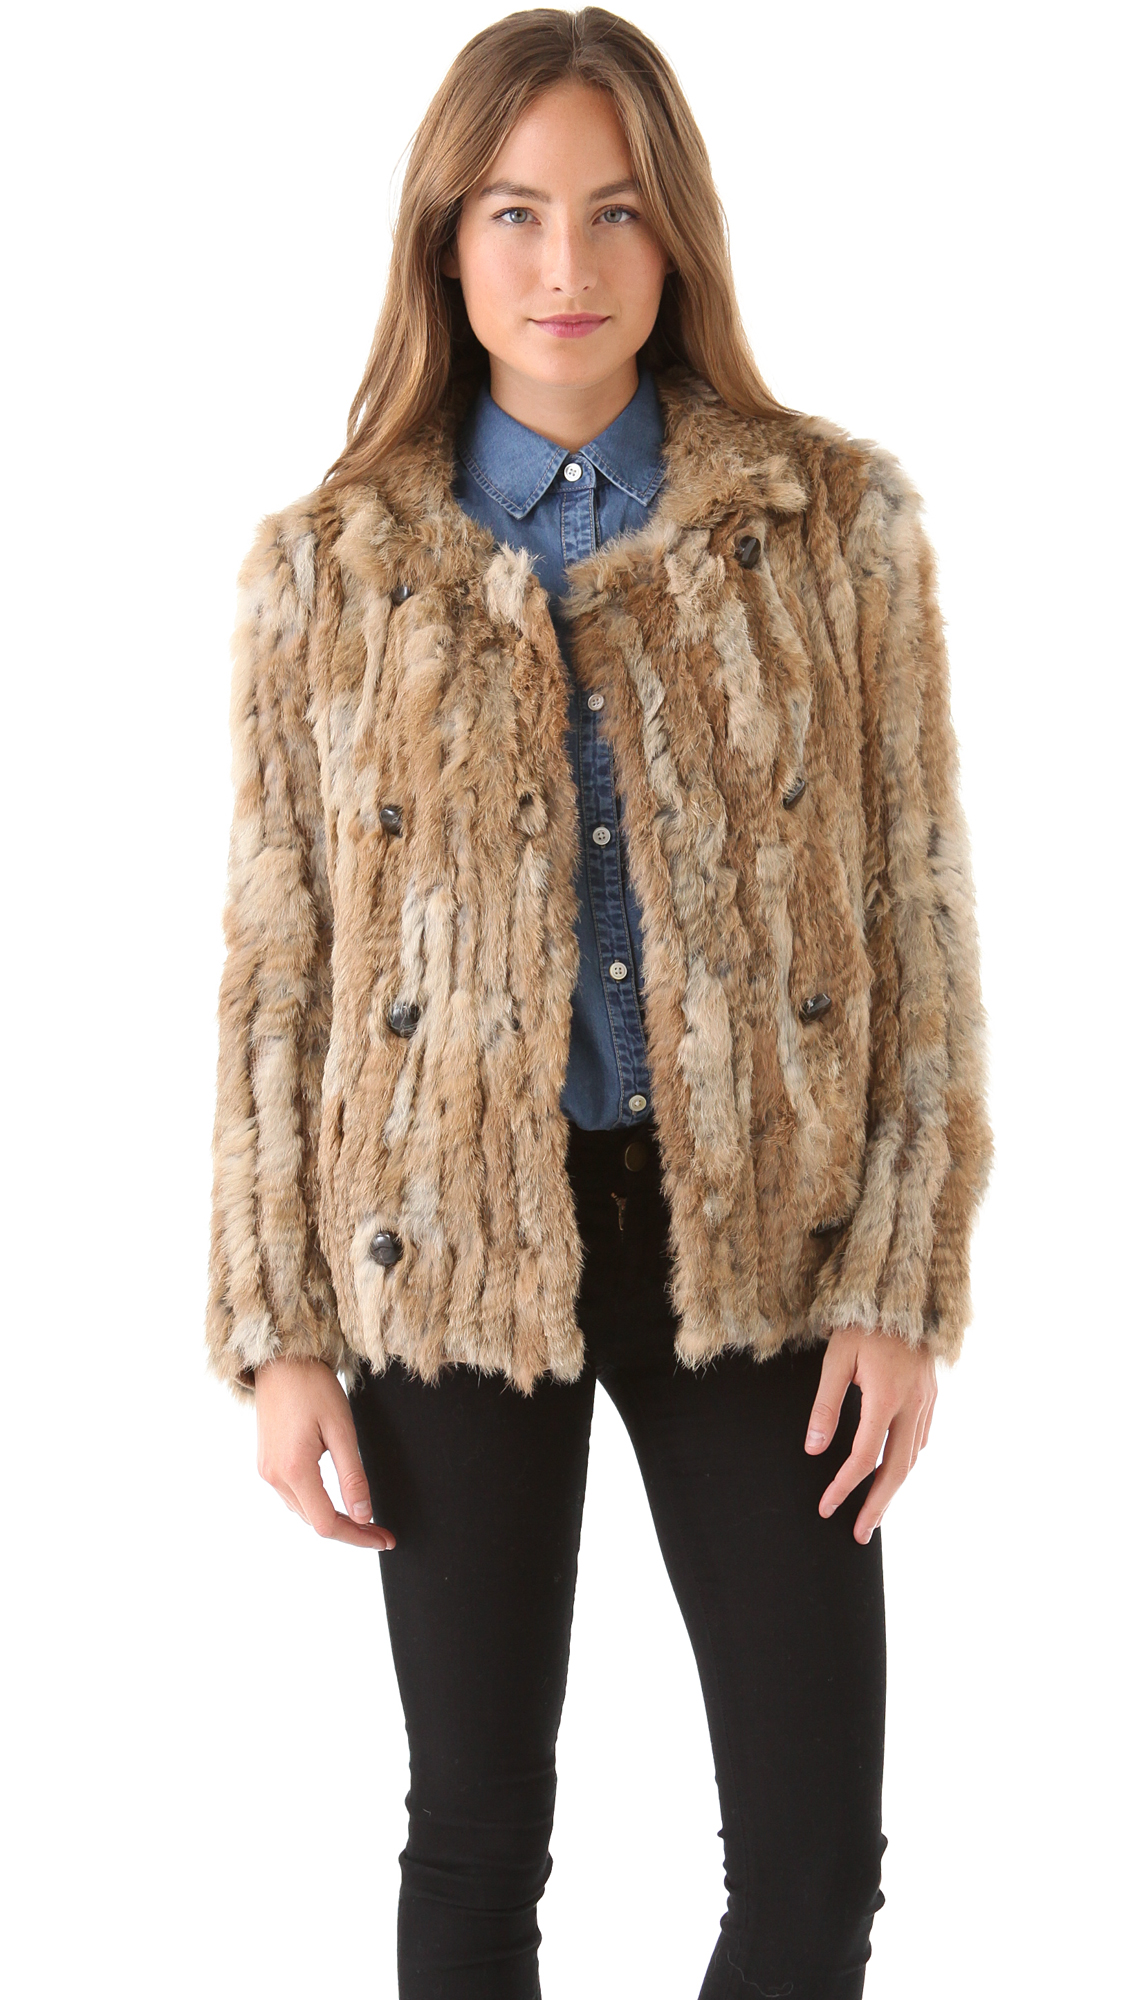 Marc by Marc Jacobs Karina Rabbit Fur Coat | SHOPBOP